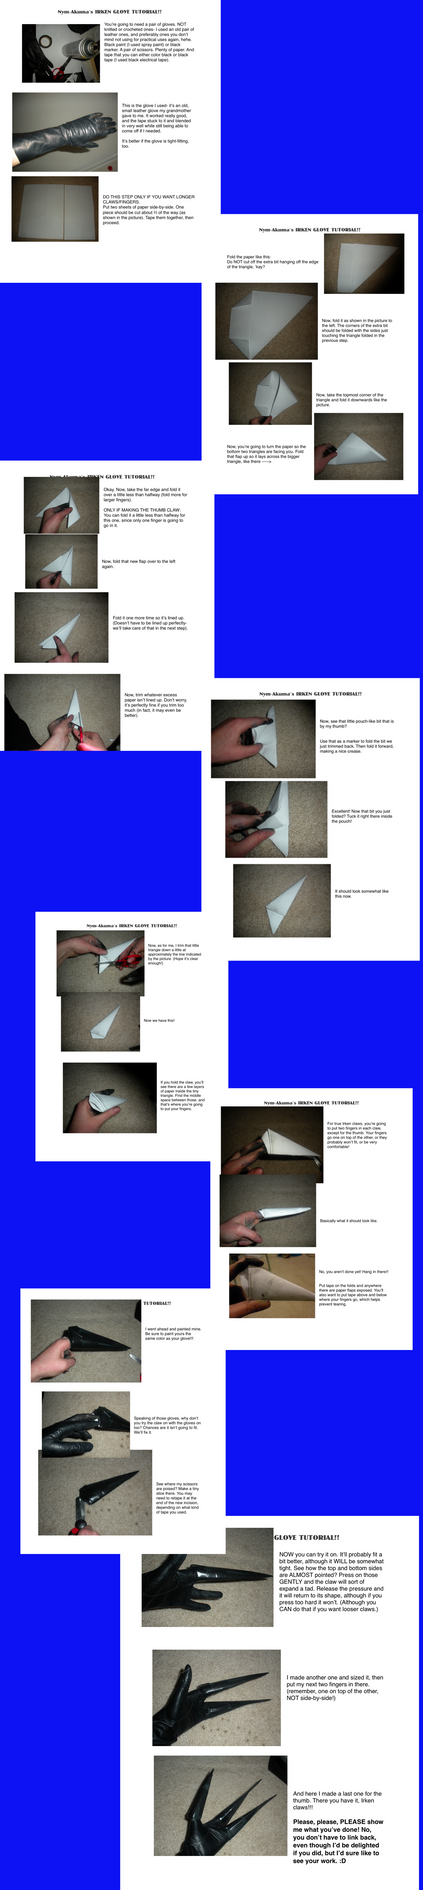 Irken 3-Finger Glove Tutorial by Nym-Akuma